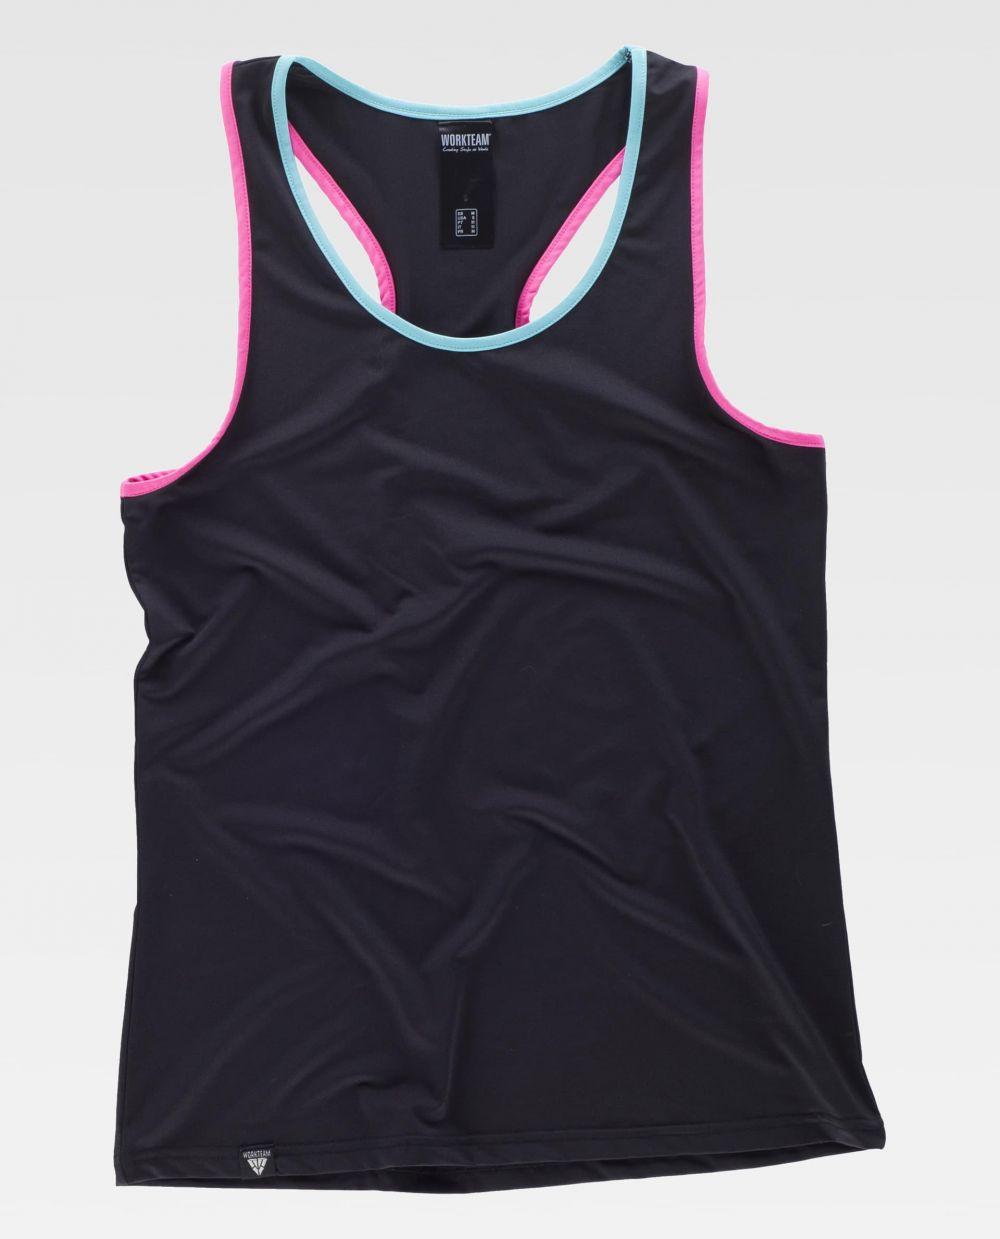 Fitness workteam camiseta deportiva s7520 de algodon vista 2